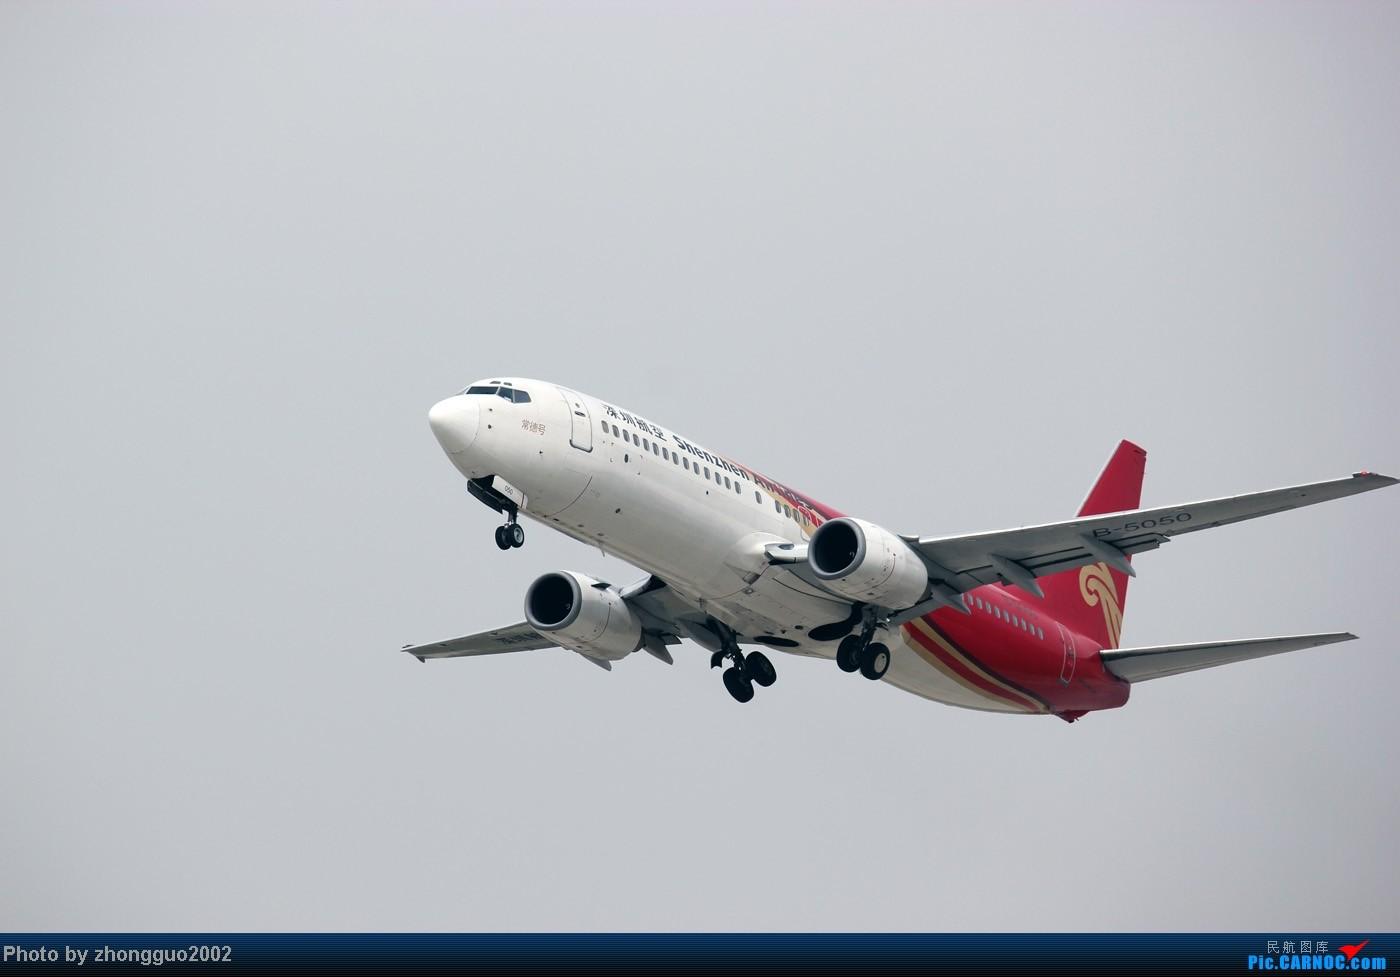 Re:[原创]随着2012年的最后一场雪的到了,我的2012年拍机工作也圆满的结束了,把这段时间里灰机整理一下,把没发的,我个人认为好的发上来! BOEING 737-800 B-5050 中国呼和浩特白塔国际机场